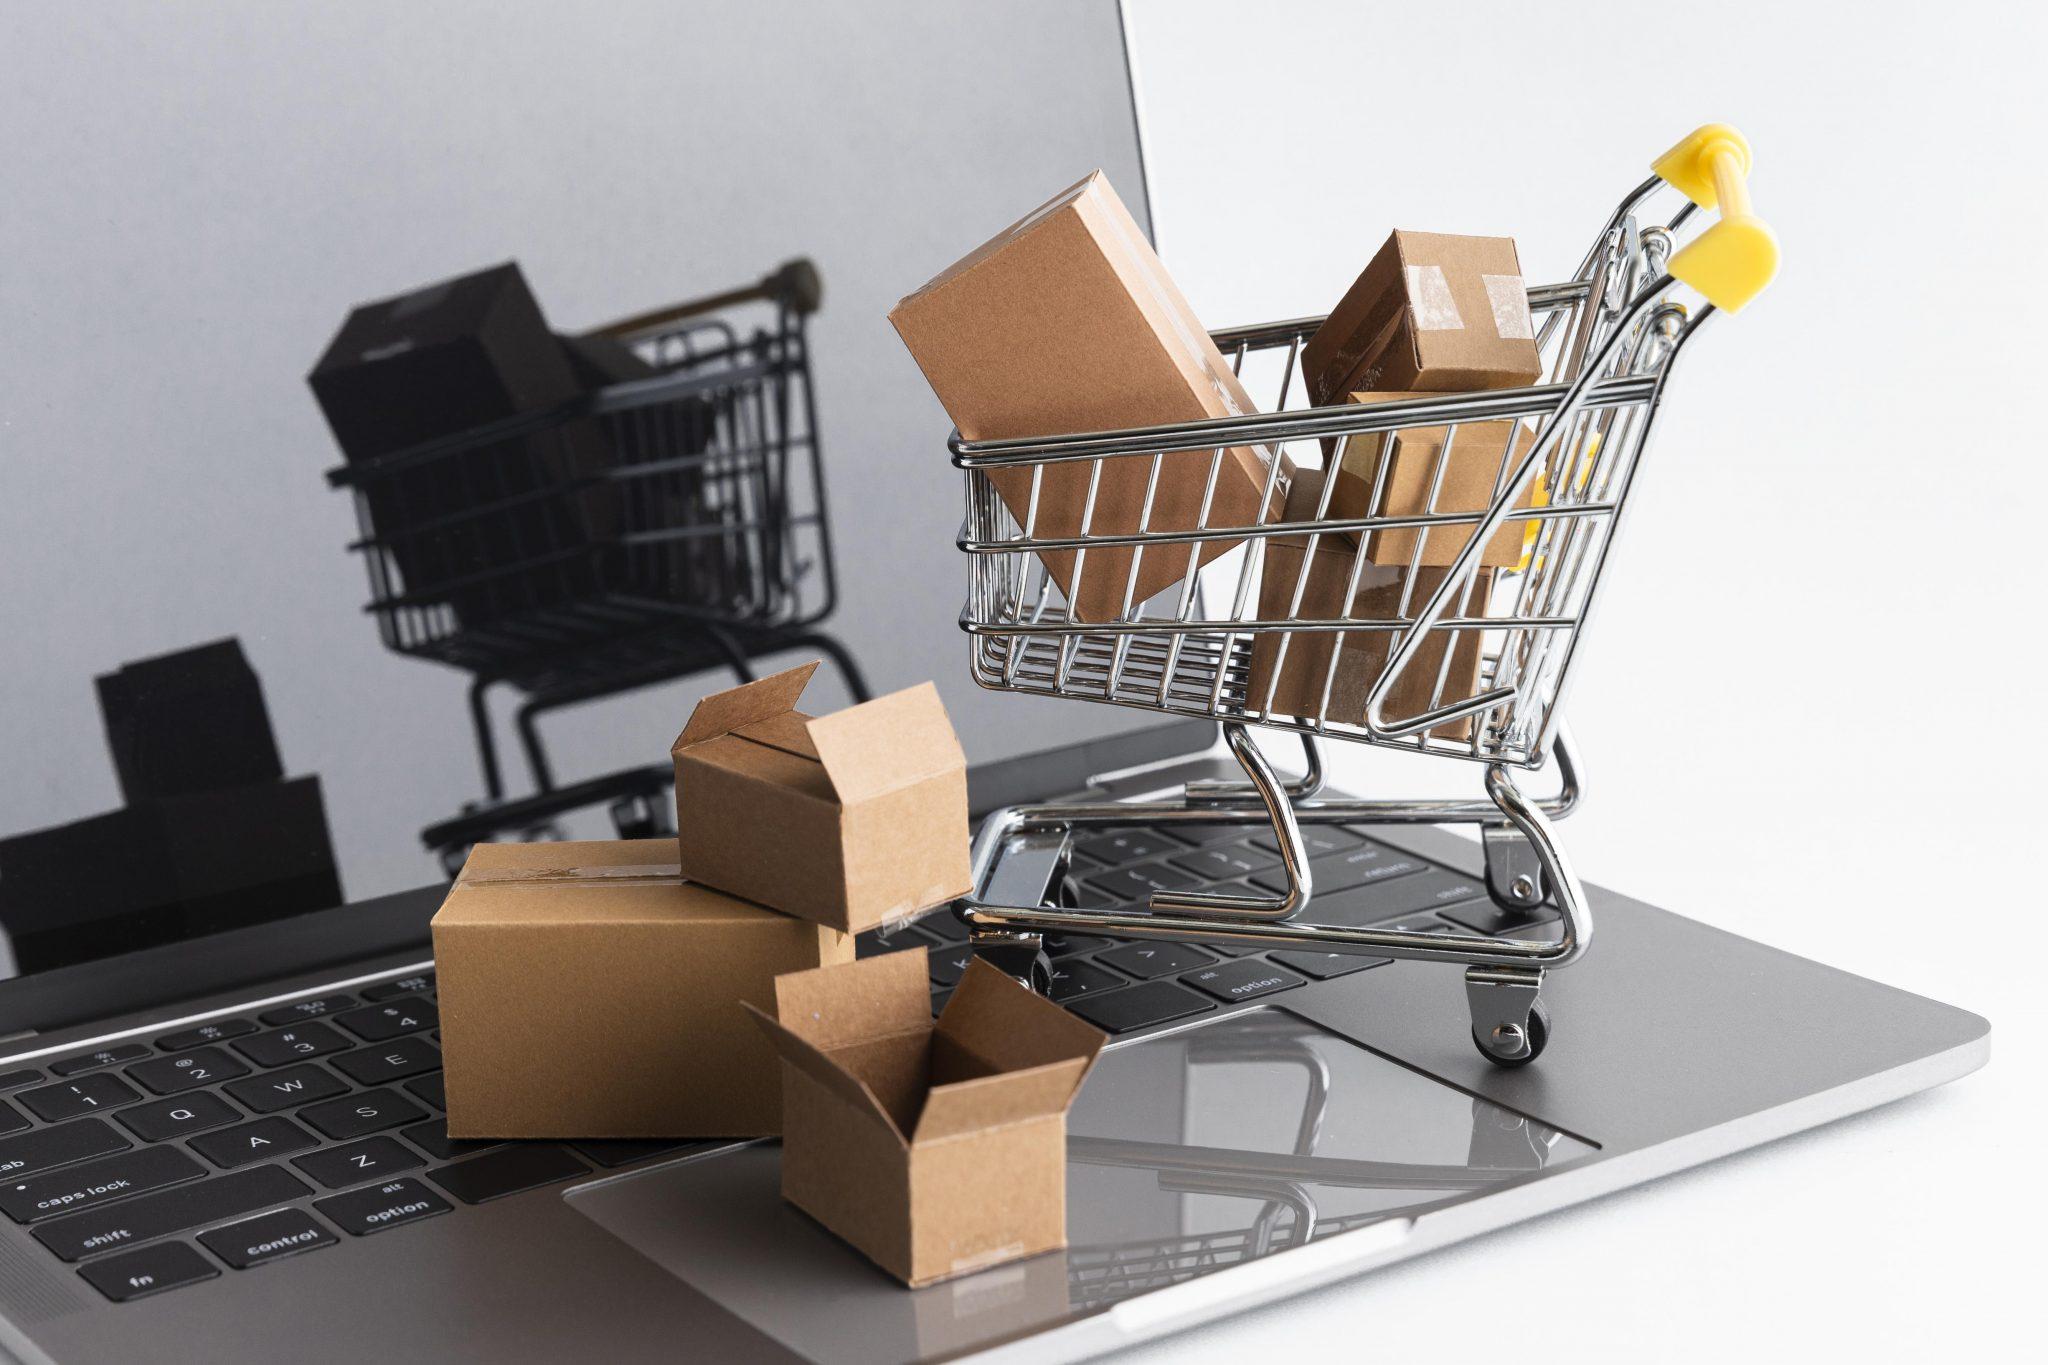 Compras online freepik